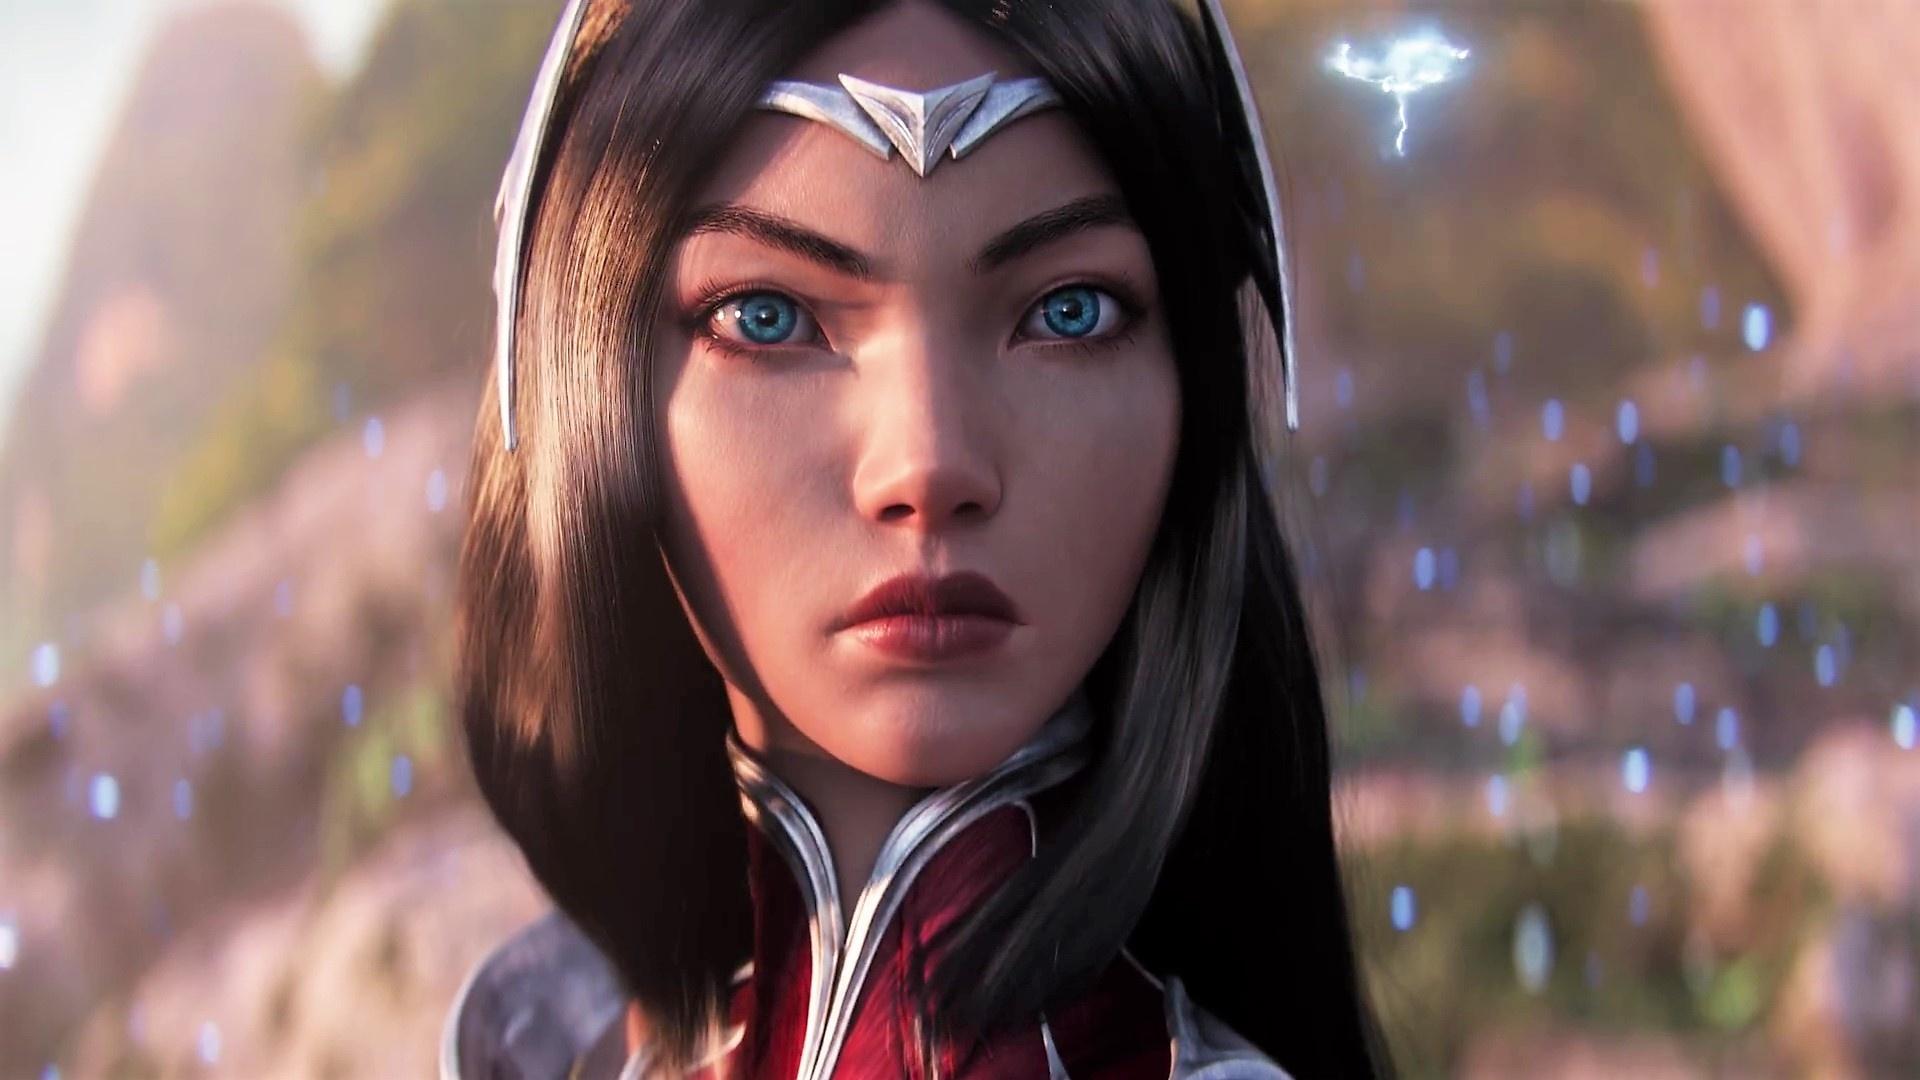 League of Legends: Awaken - Video zum Start der Season 2019 sorgt für Gänsehaut & erobert Youtube